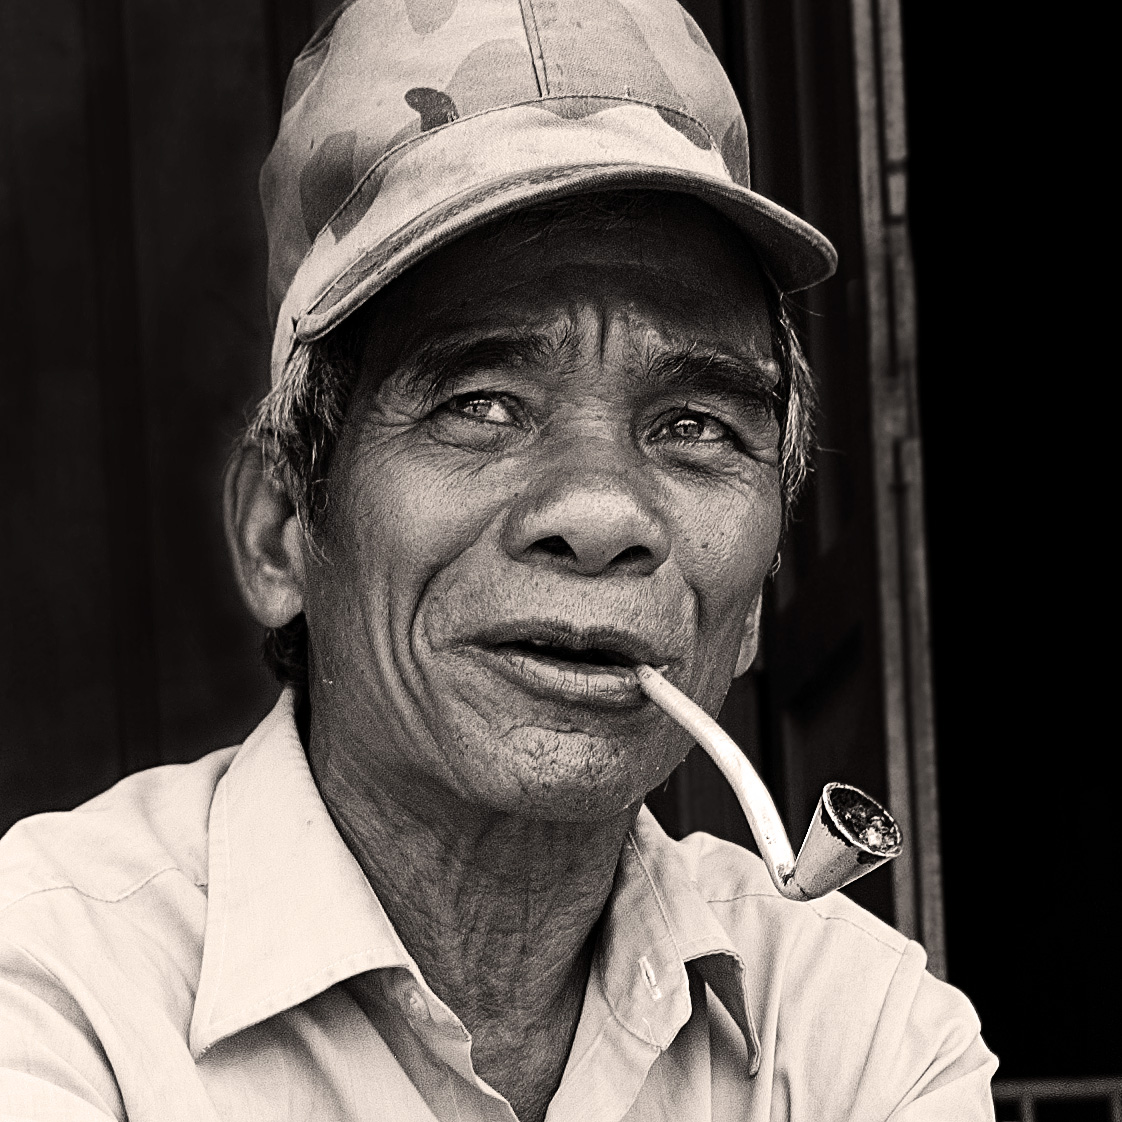 highland minority man smokes a pipe